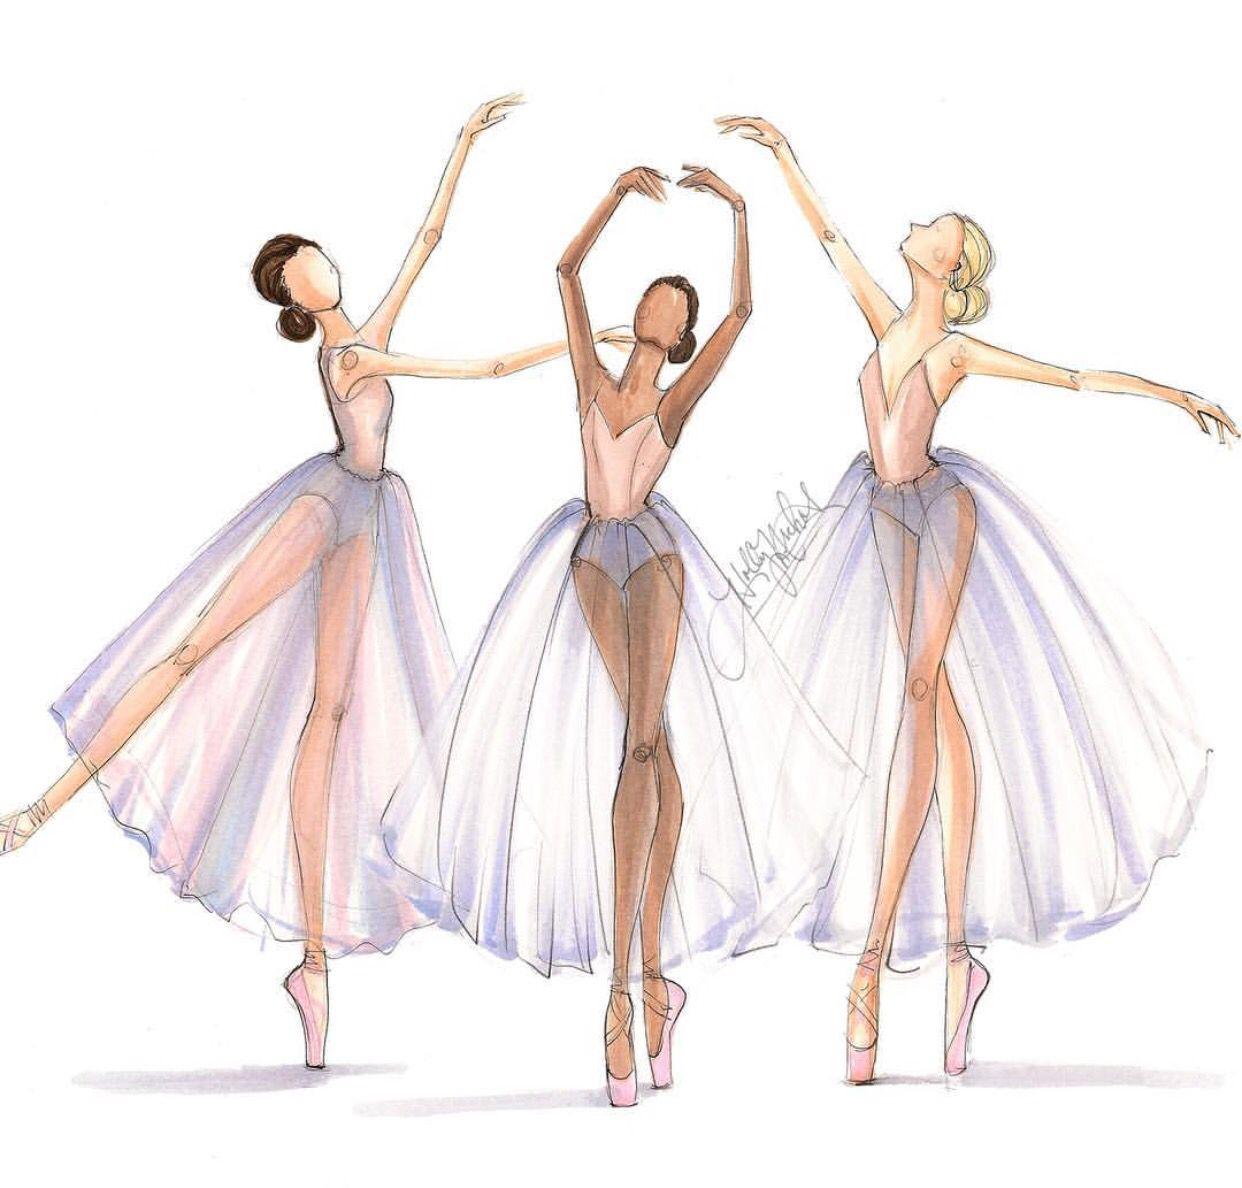 Тебе, картинки балета для срисовки